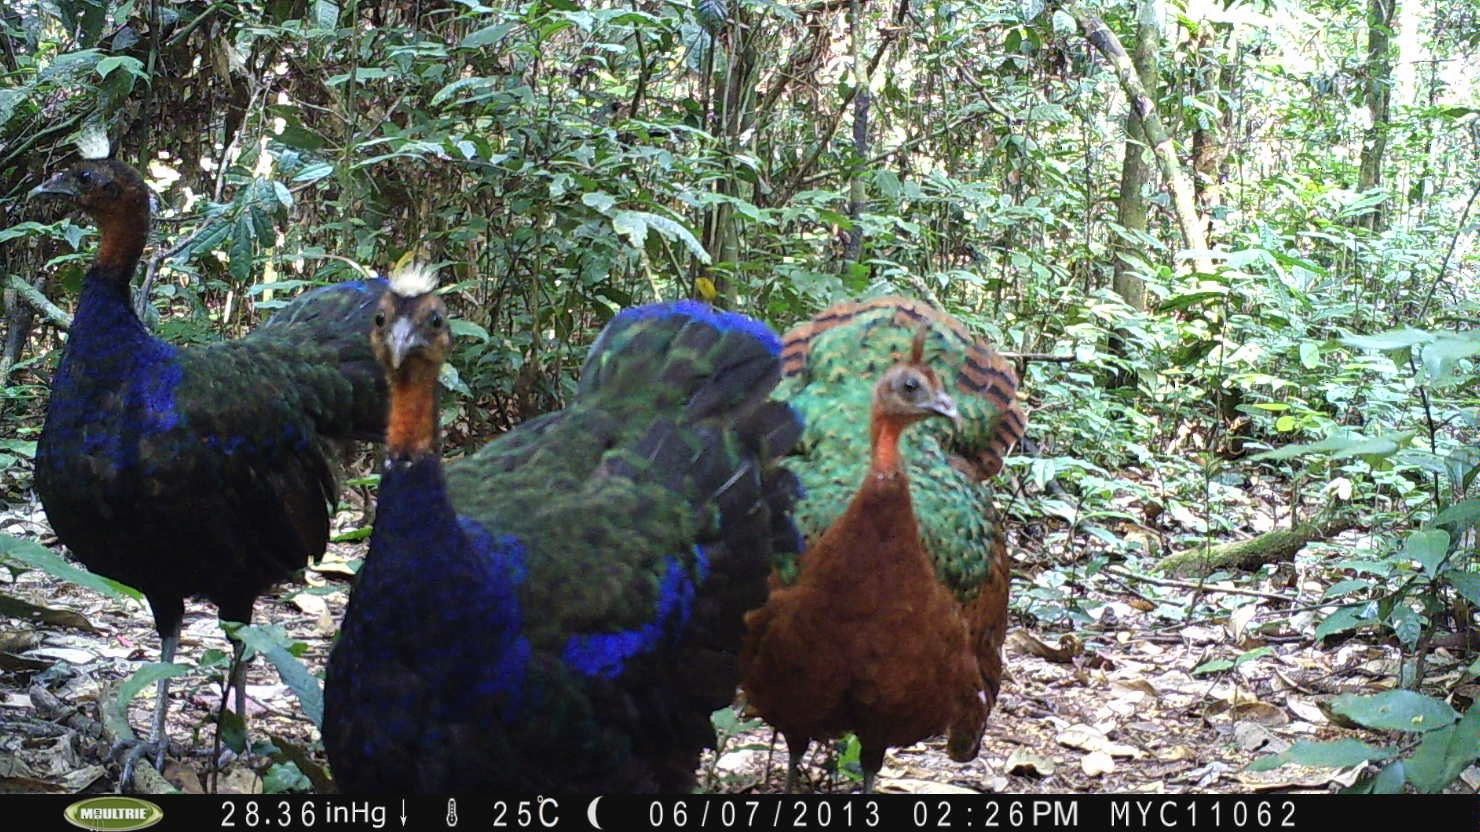 Congo Peacock - TL2 Project